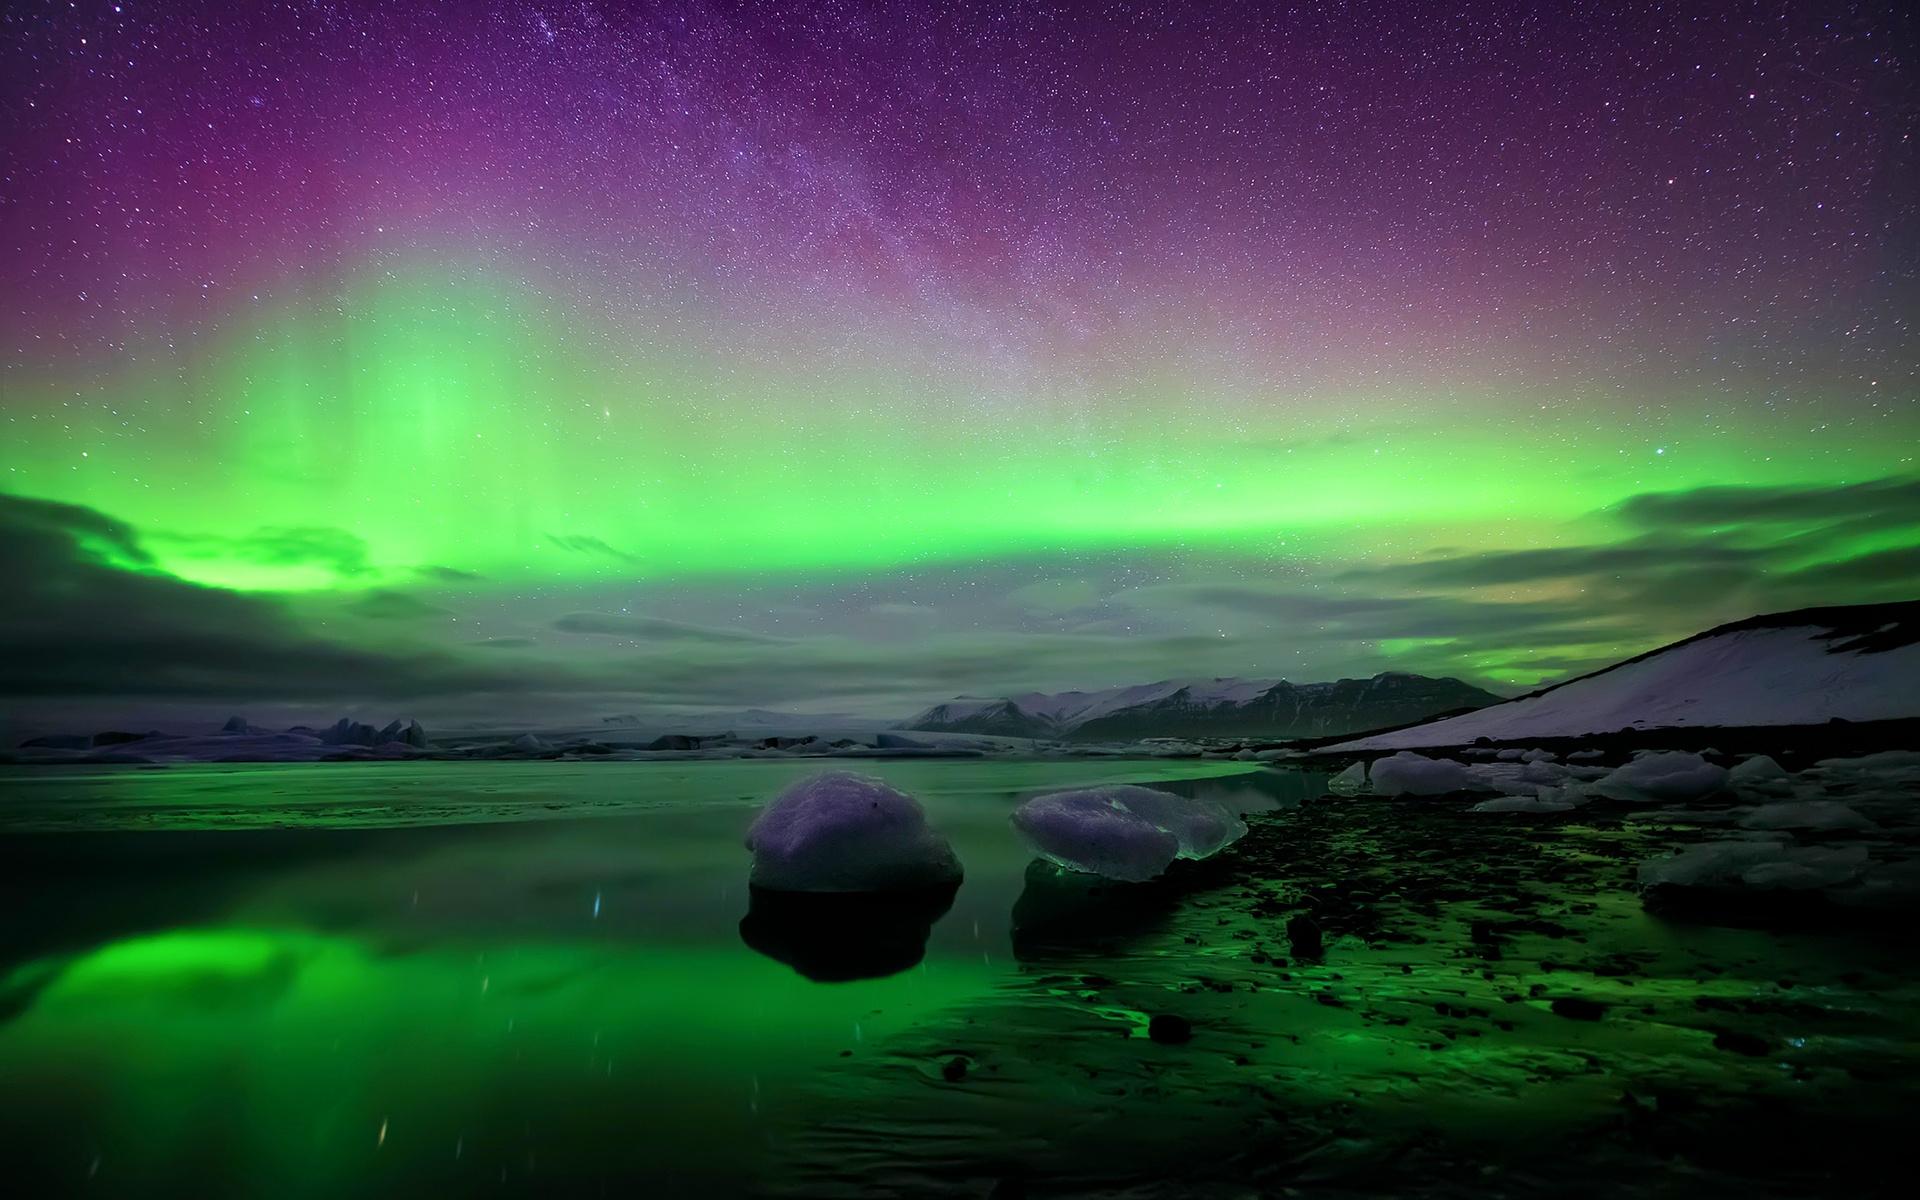 northern lights wallpaper 21154